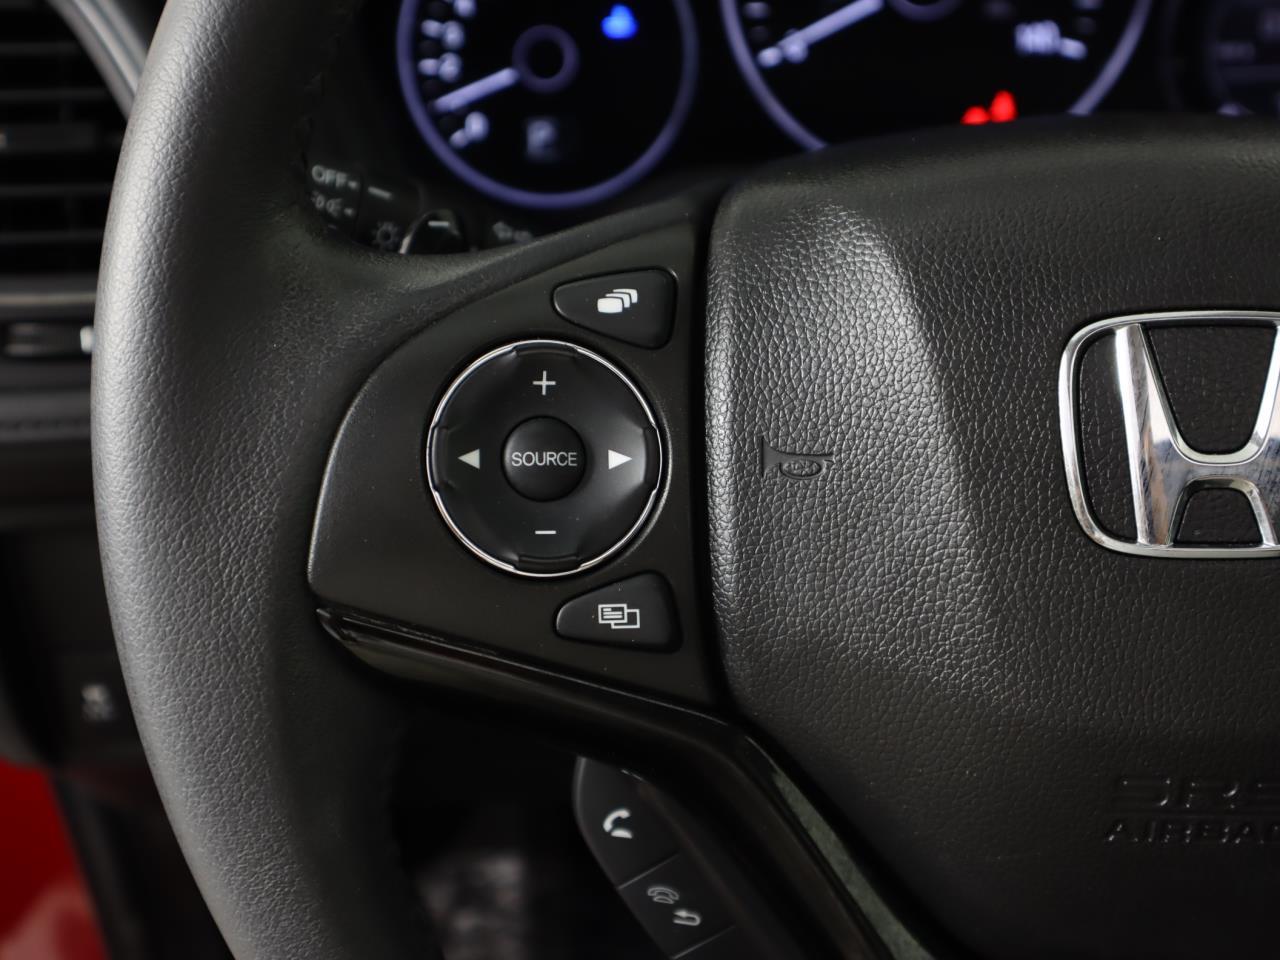 used vehicle - SUV HONDA HR-V 2017